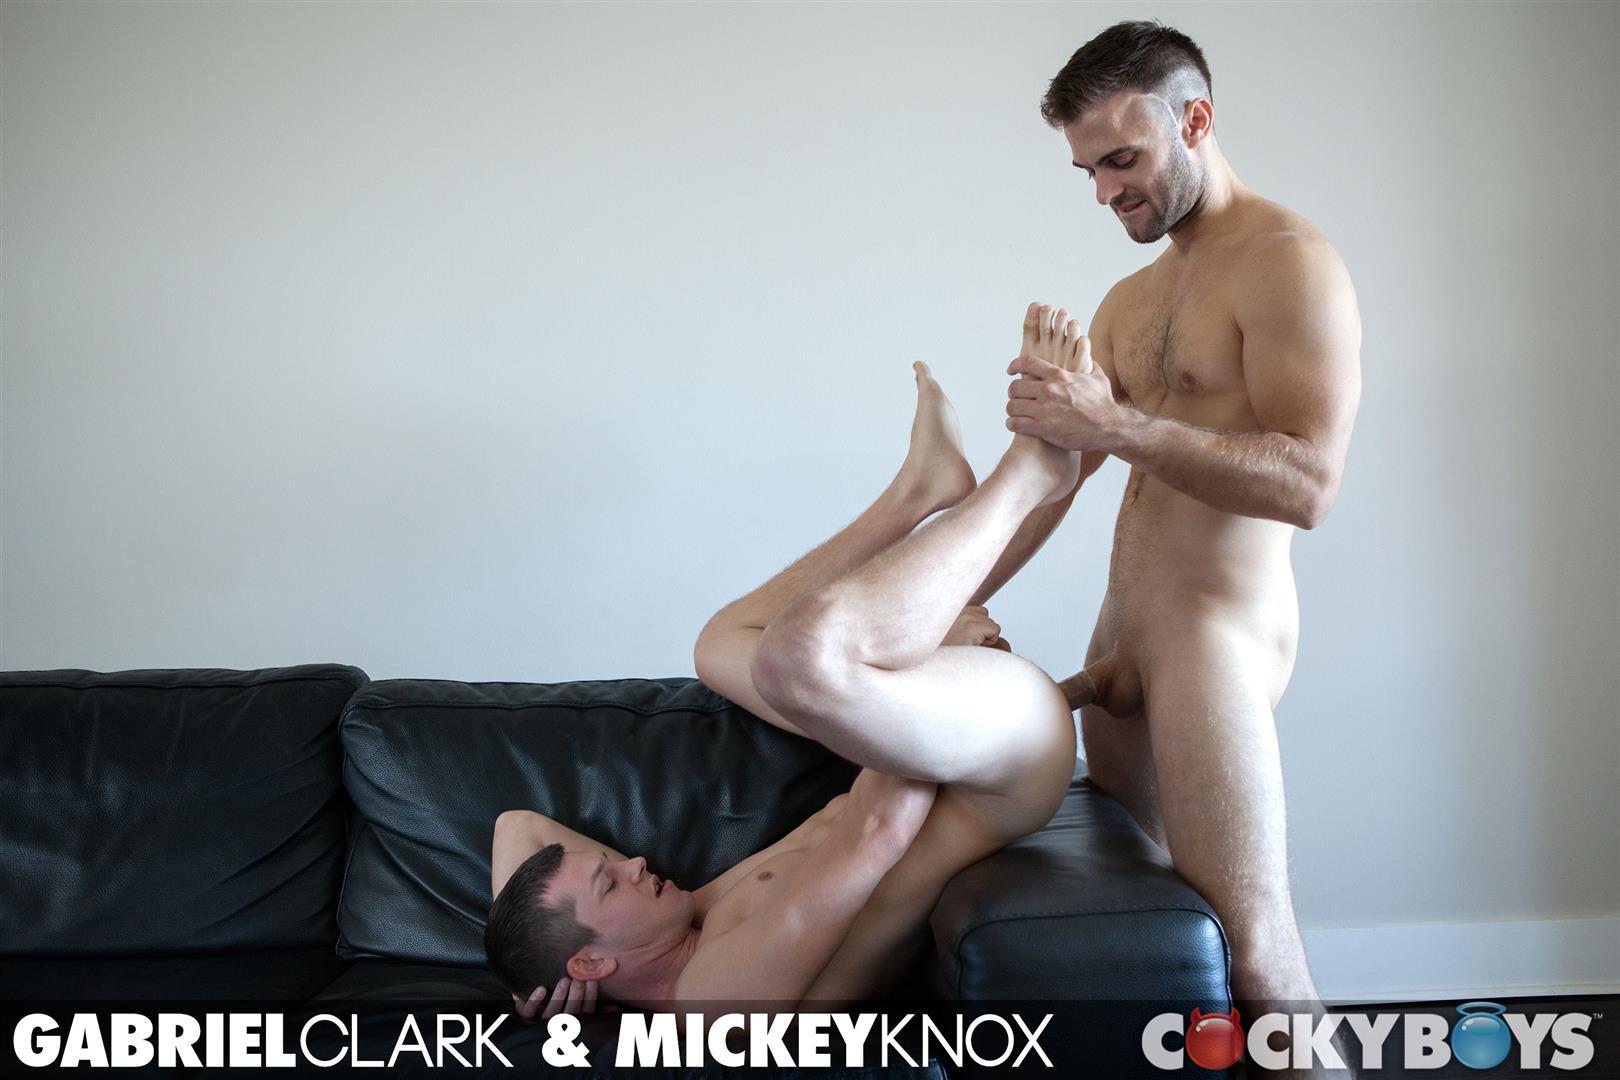 Cockyboys Mickey Knox and Gabriel Clark American Boys Thick Cocks Fucking Amateur Gay Porn 20 All American Boys Mickey Knox and Gabriel Clark Share A Fuck